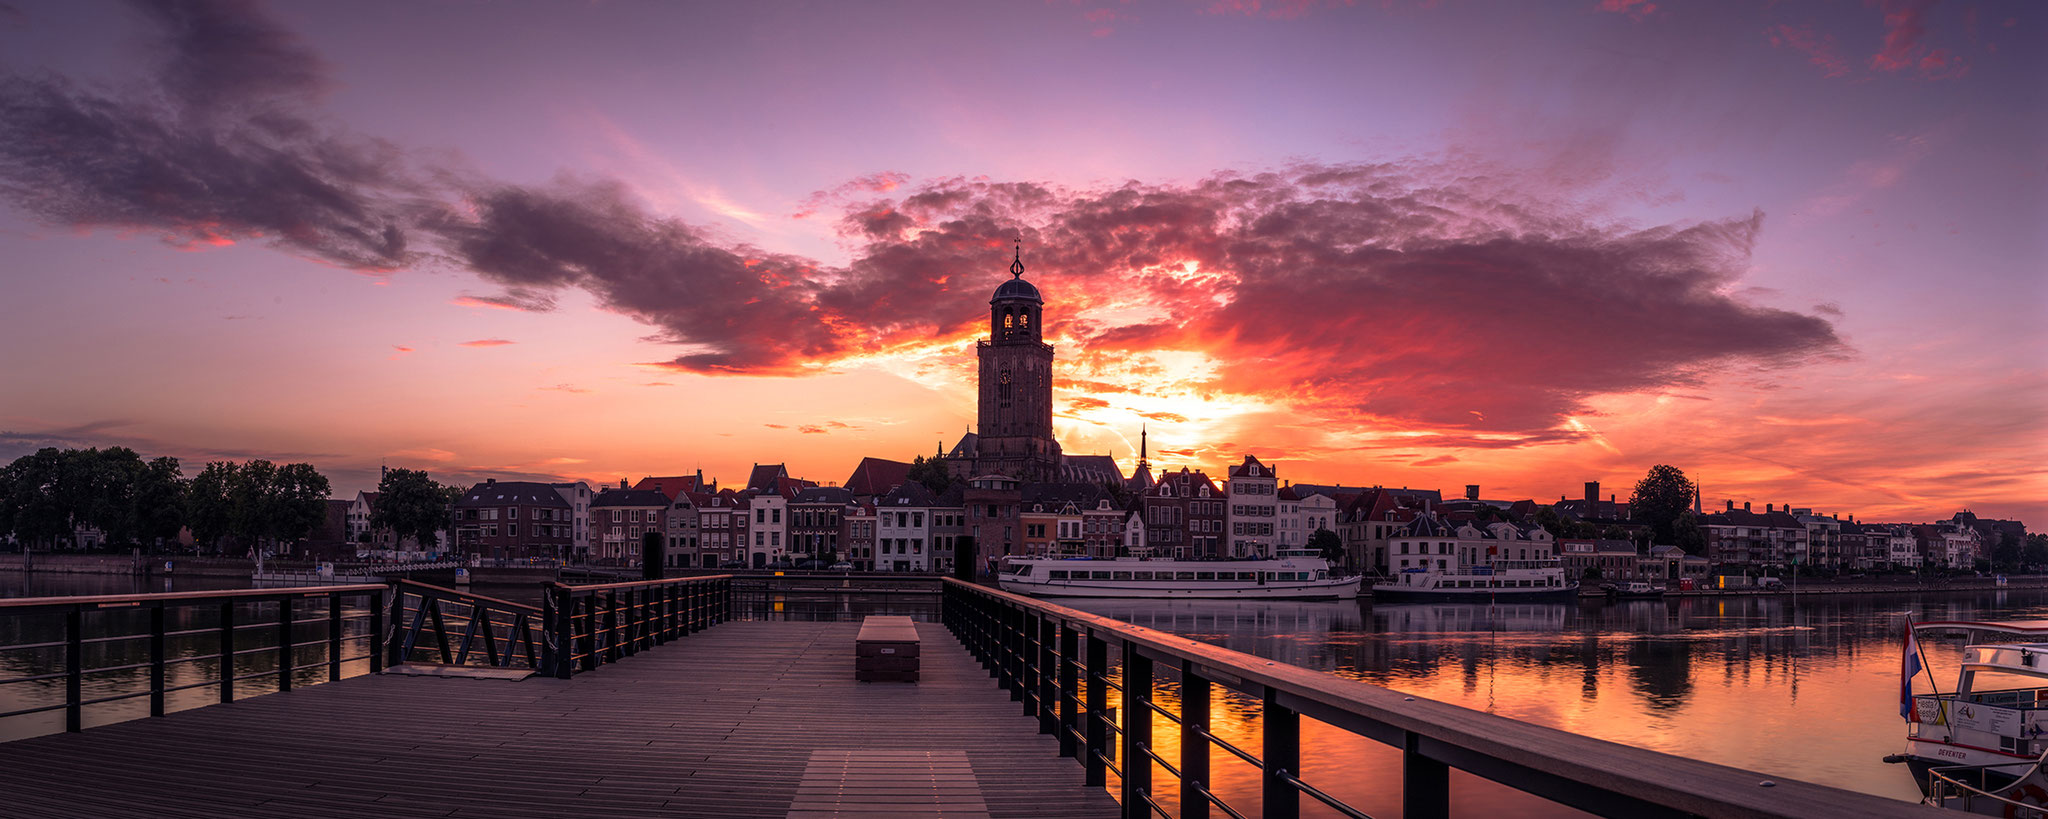 Deventer, the Netherlands, Martijn van Steenbergen, © 2018